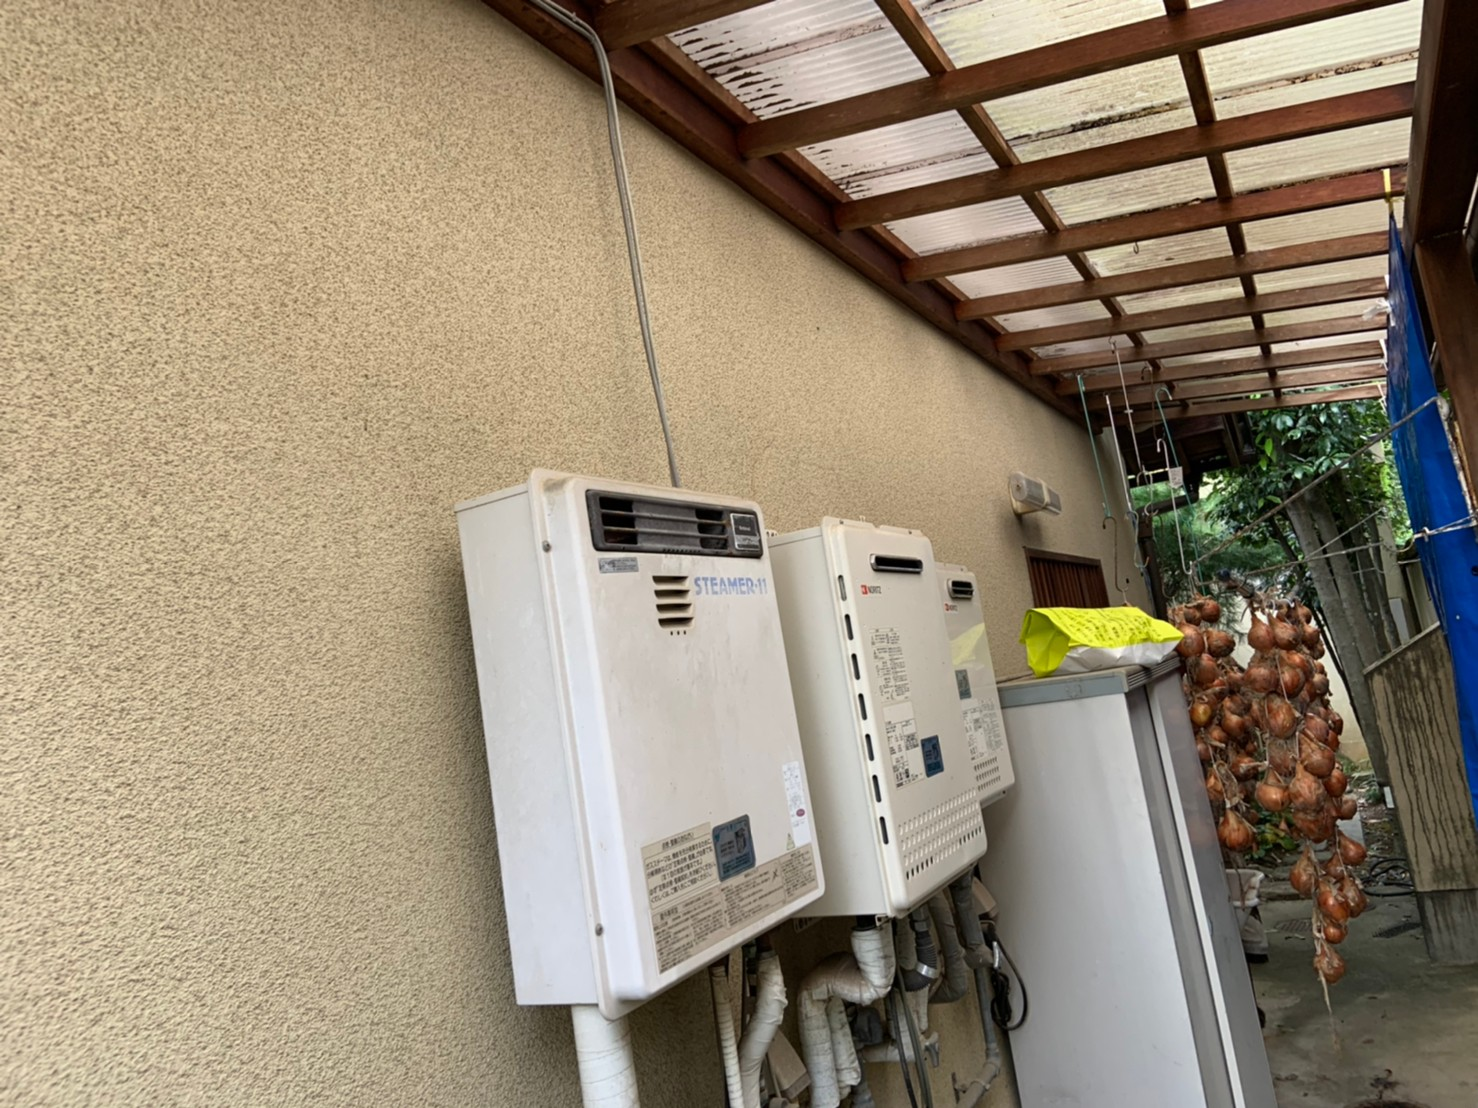 ガス浴室暖房乾燥機の新設工事|RBH-W414K|京都市北区衣笠